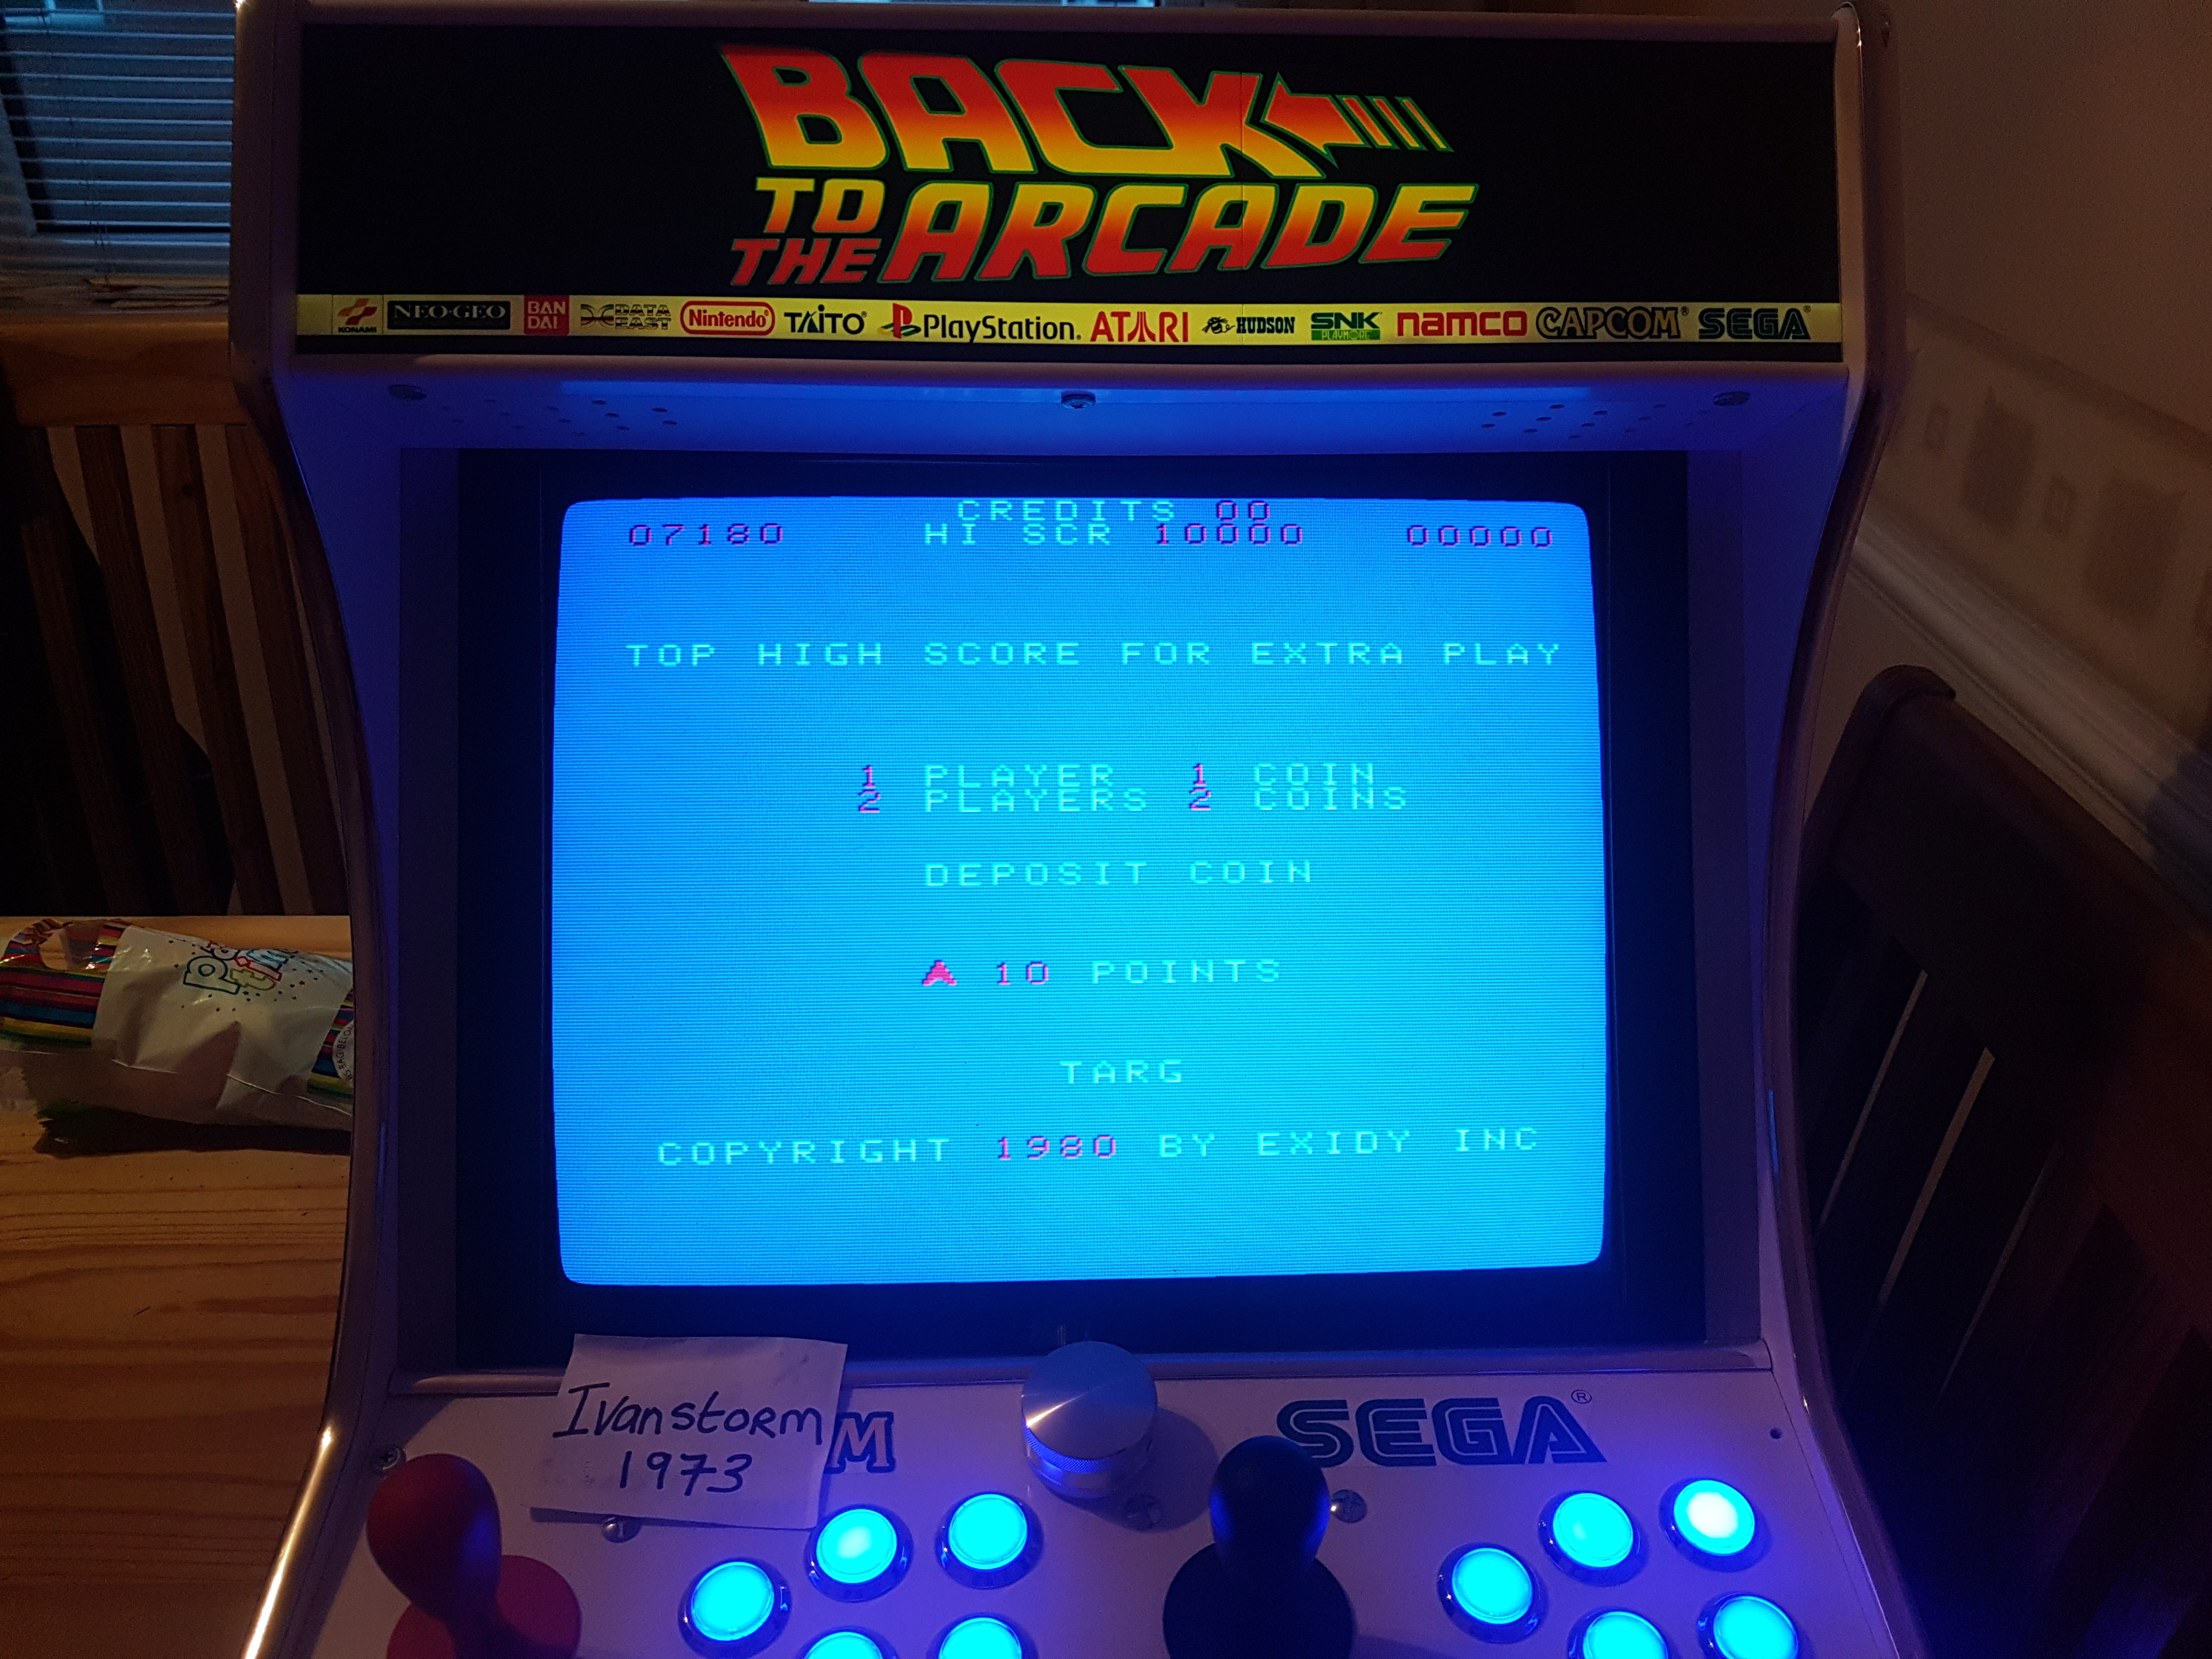 Ivanstorm1973: Targ (Arcade Emulated / M.A.M.E.) 7,180 points on 2017-11-15 15:48:06